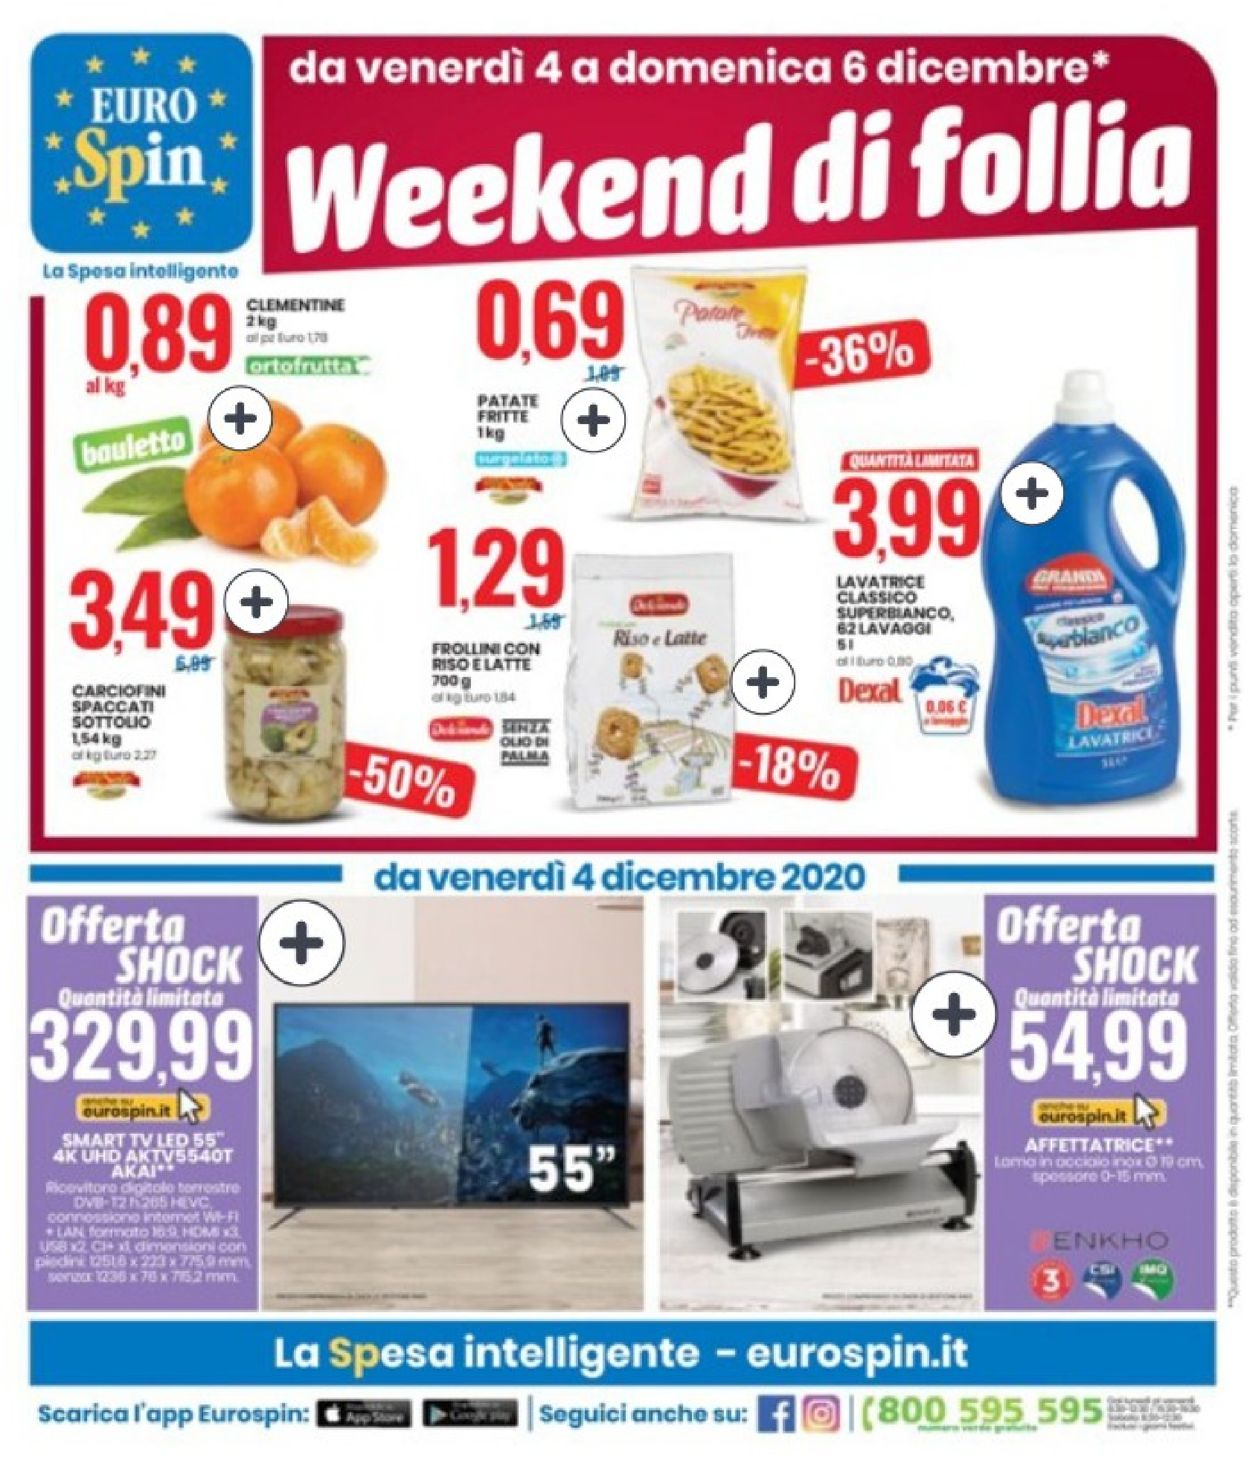 Volantino EURO Spin - Black Friday 2020 - Offerte 26/11-09/12/2020 (Pagina 21)